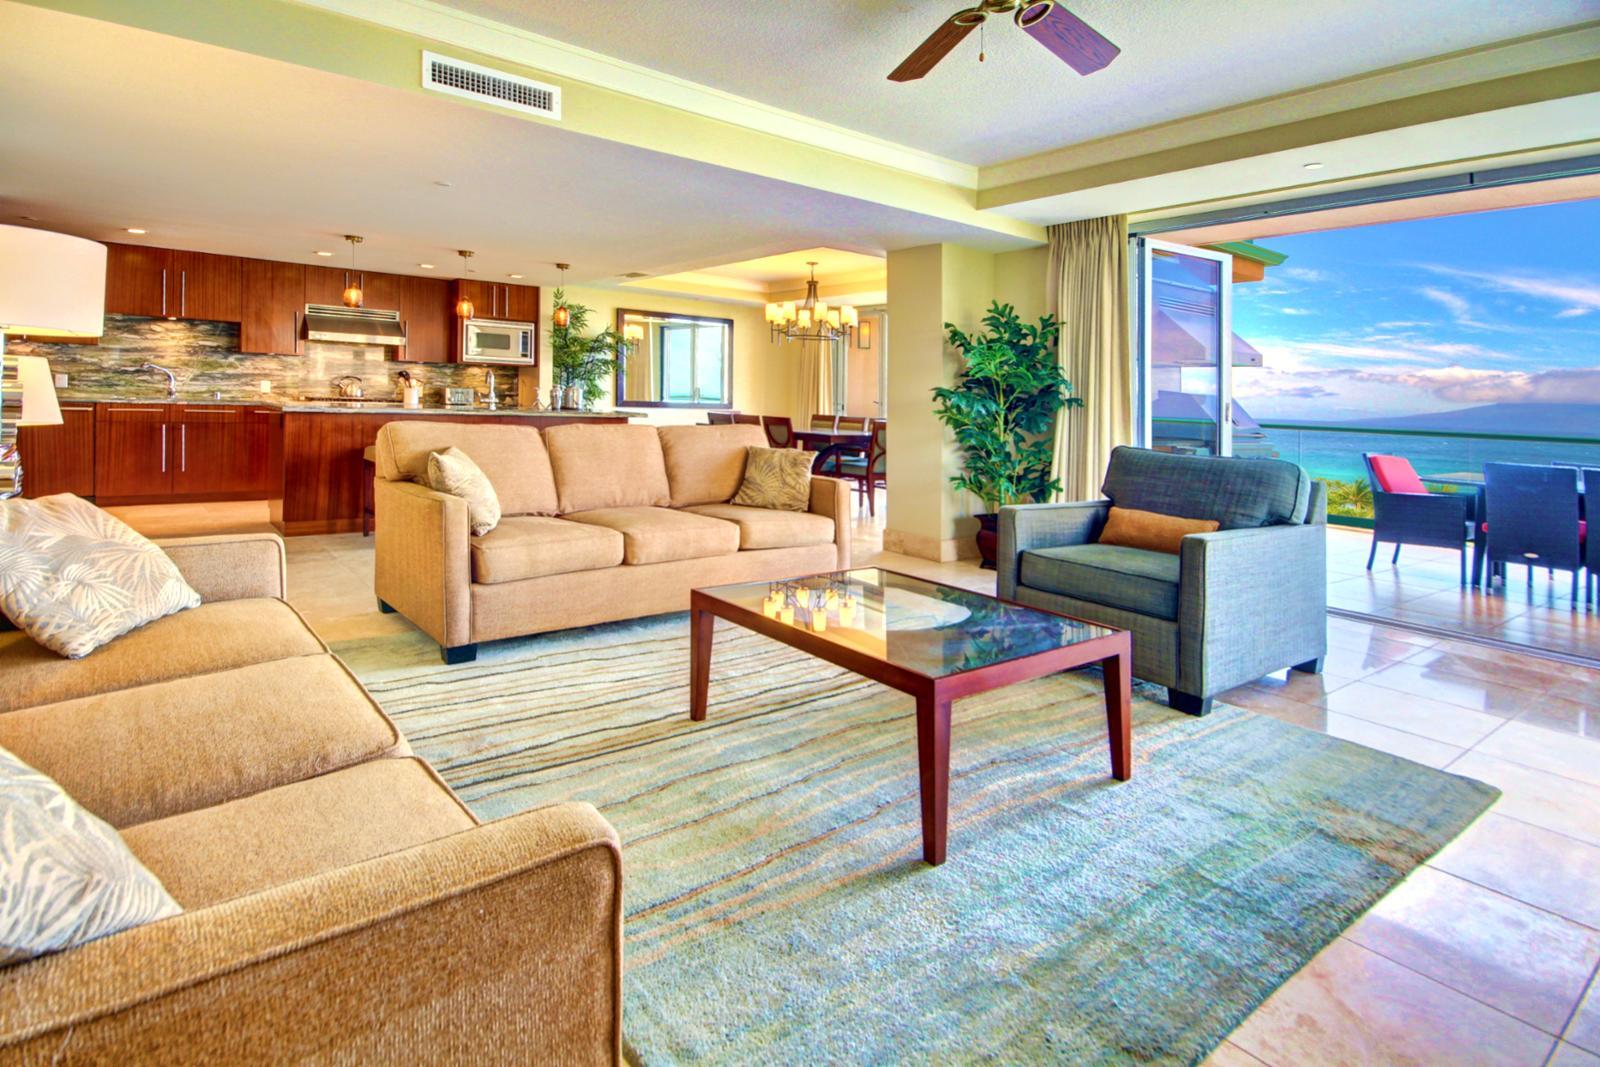 kbm hawaii honua kai hkk 550 luxury vacation rental at beach